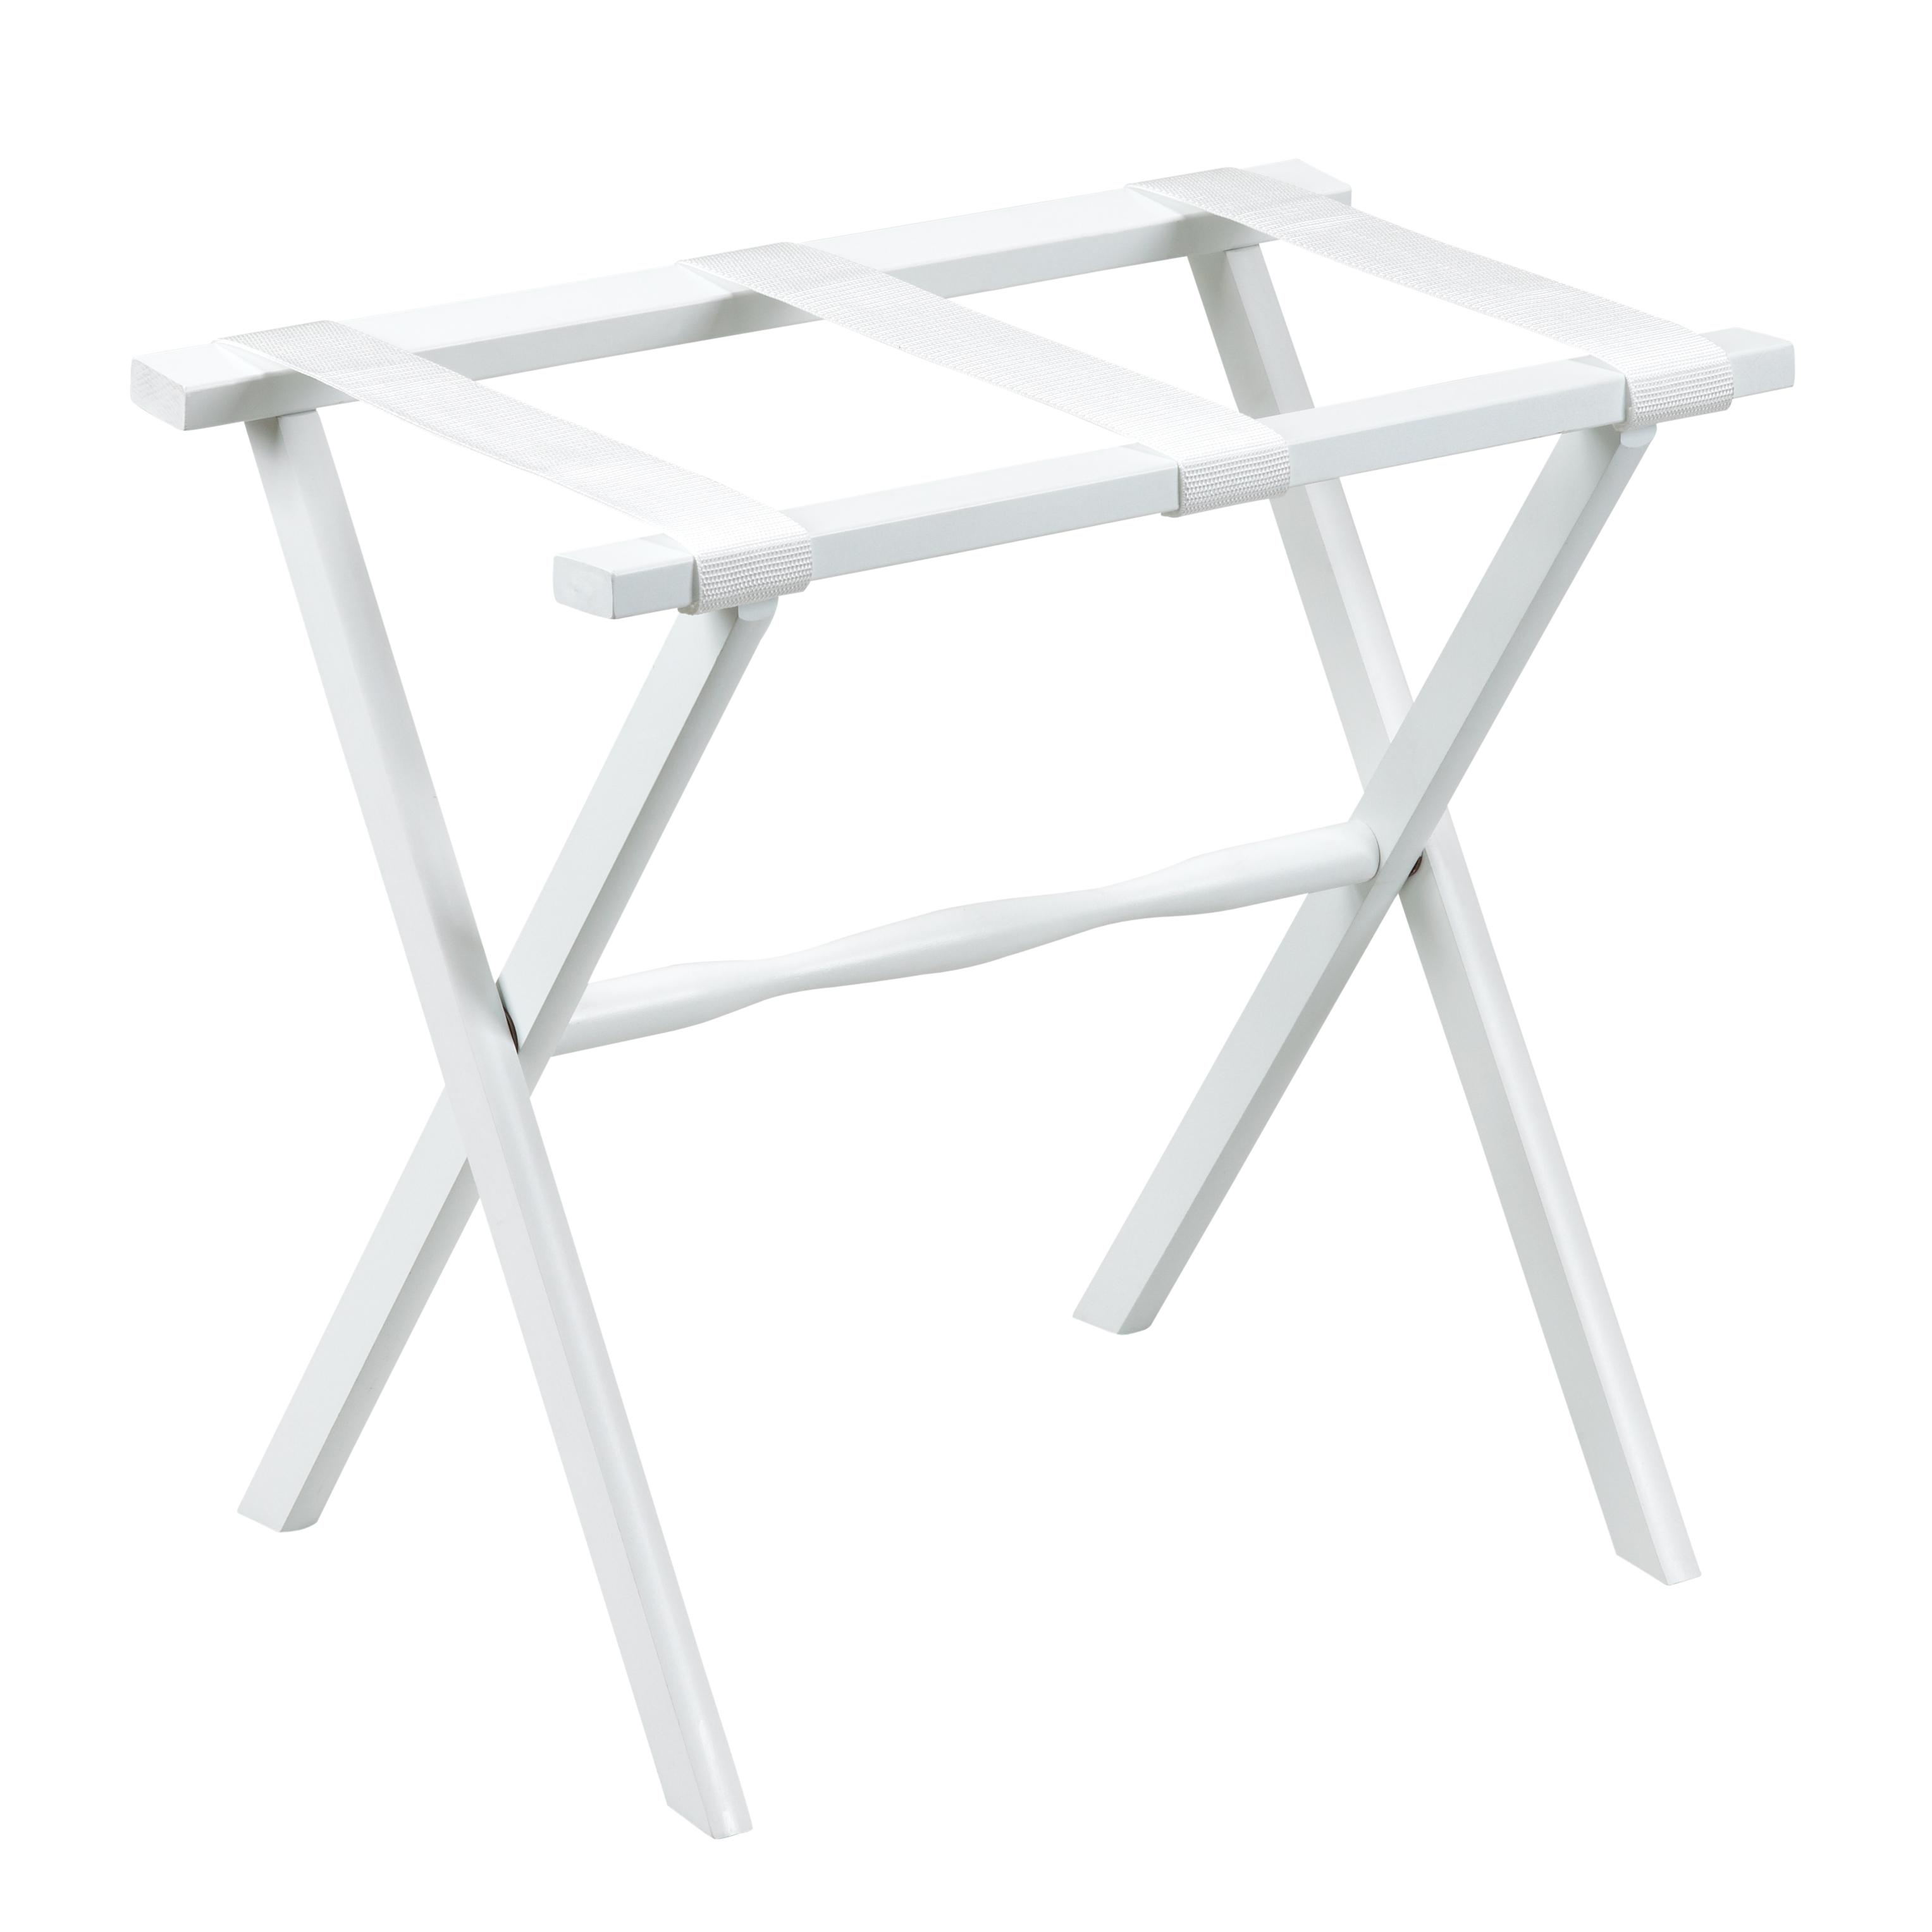 Gate House Furniture 1003 White Luggage Rack with White Nylon Straps - 23 x 13 x 20 Inch